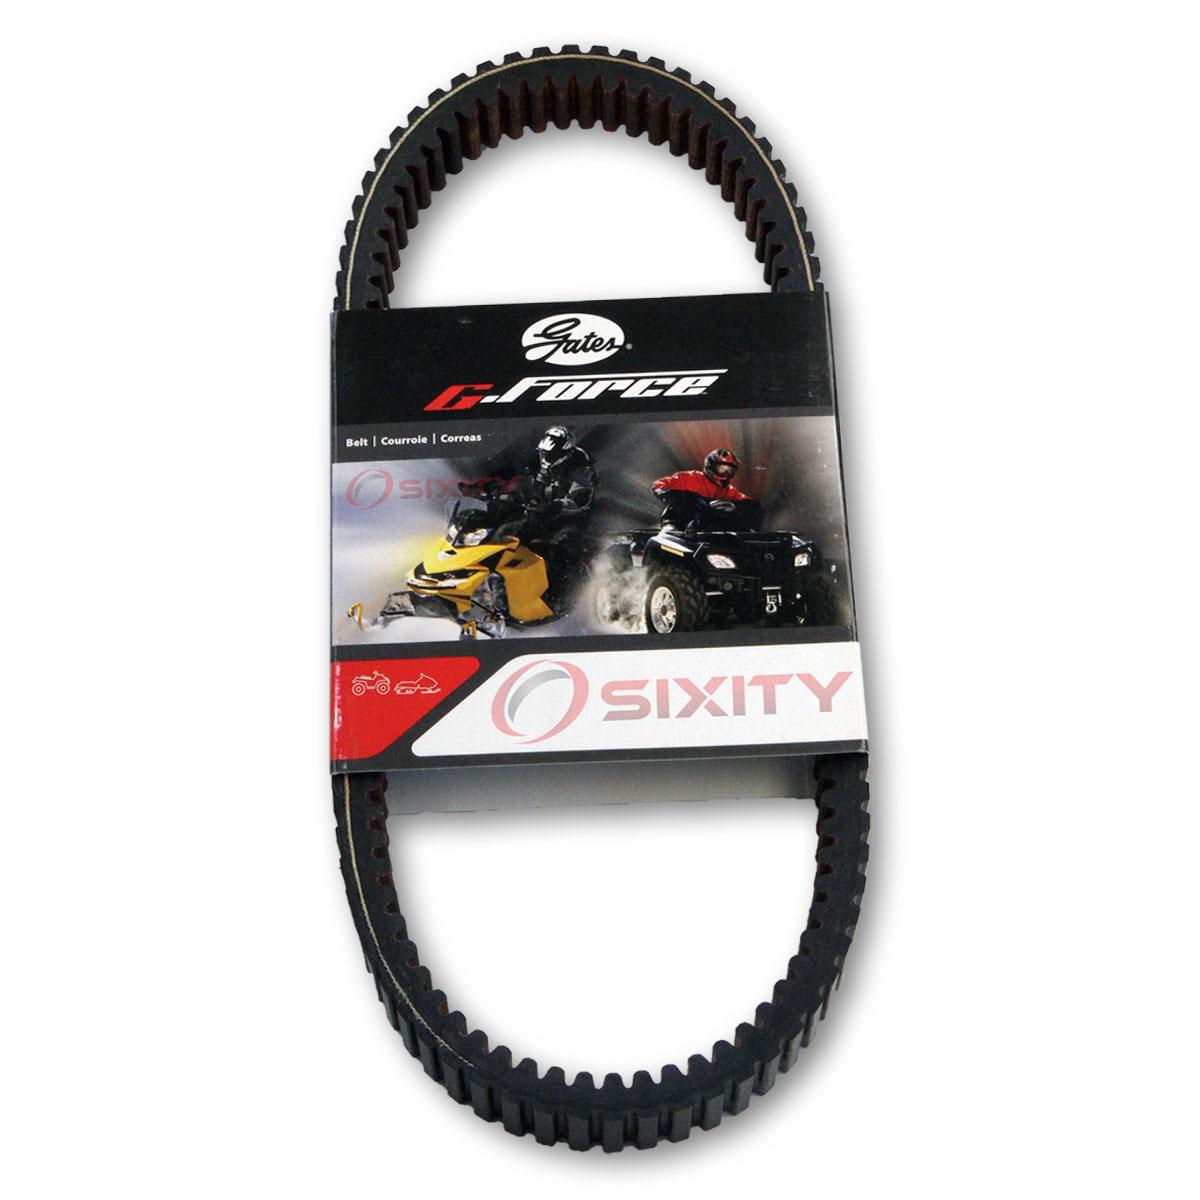 2007-2011 Yamaha Grizzly 350 YFM350 Severe Duty Drive Belt